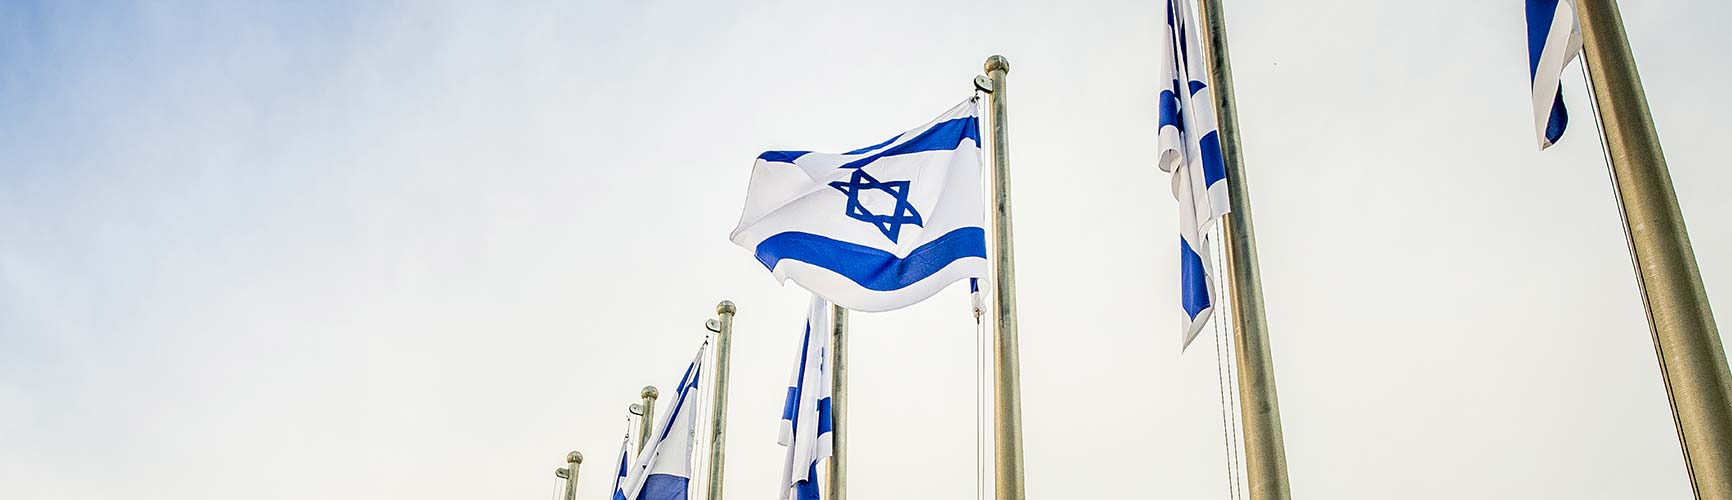 About El Shalom